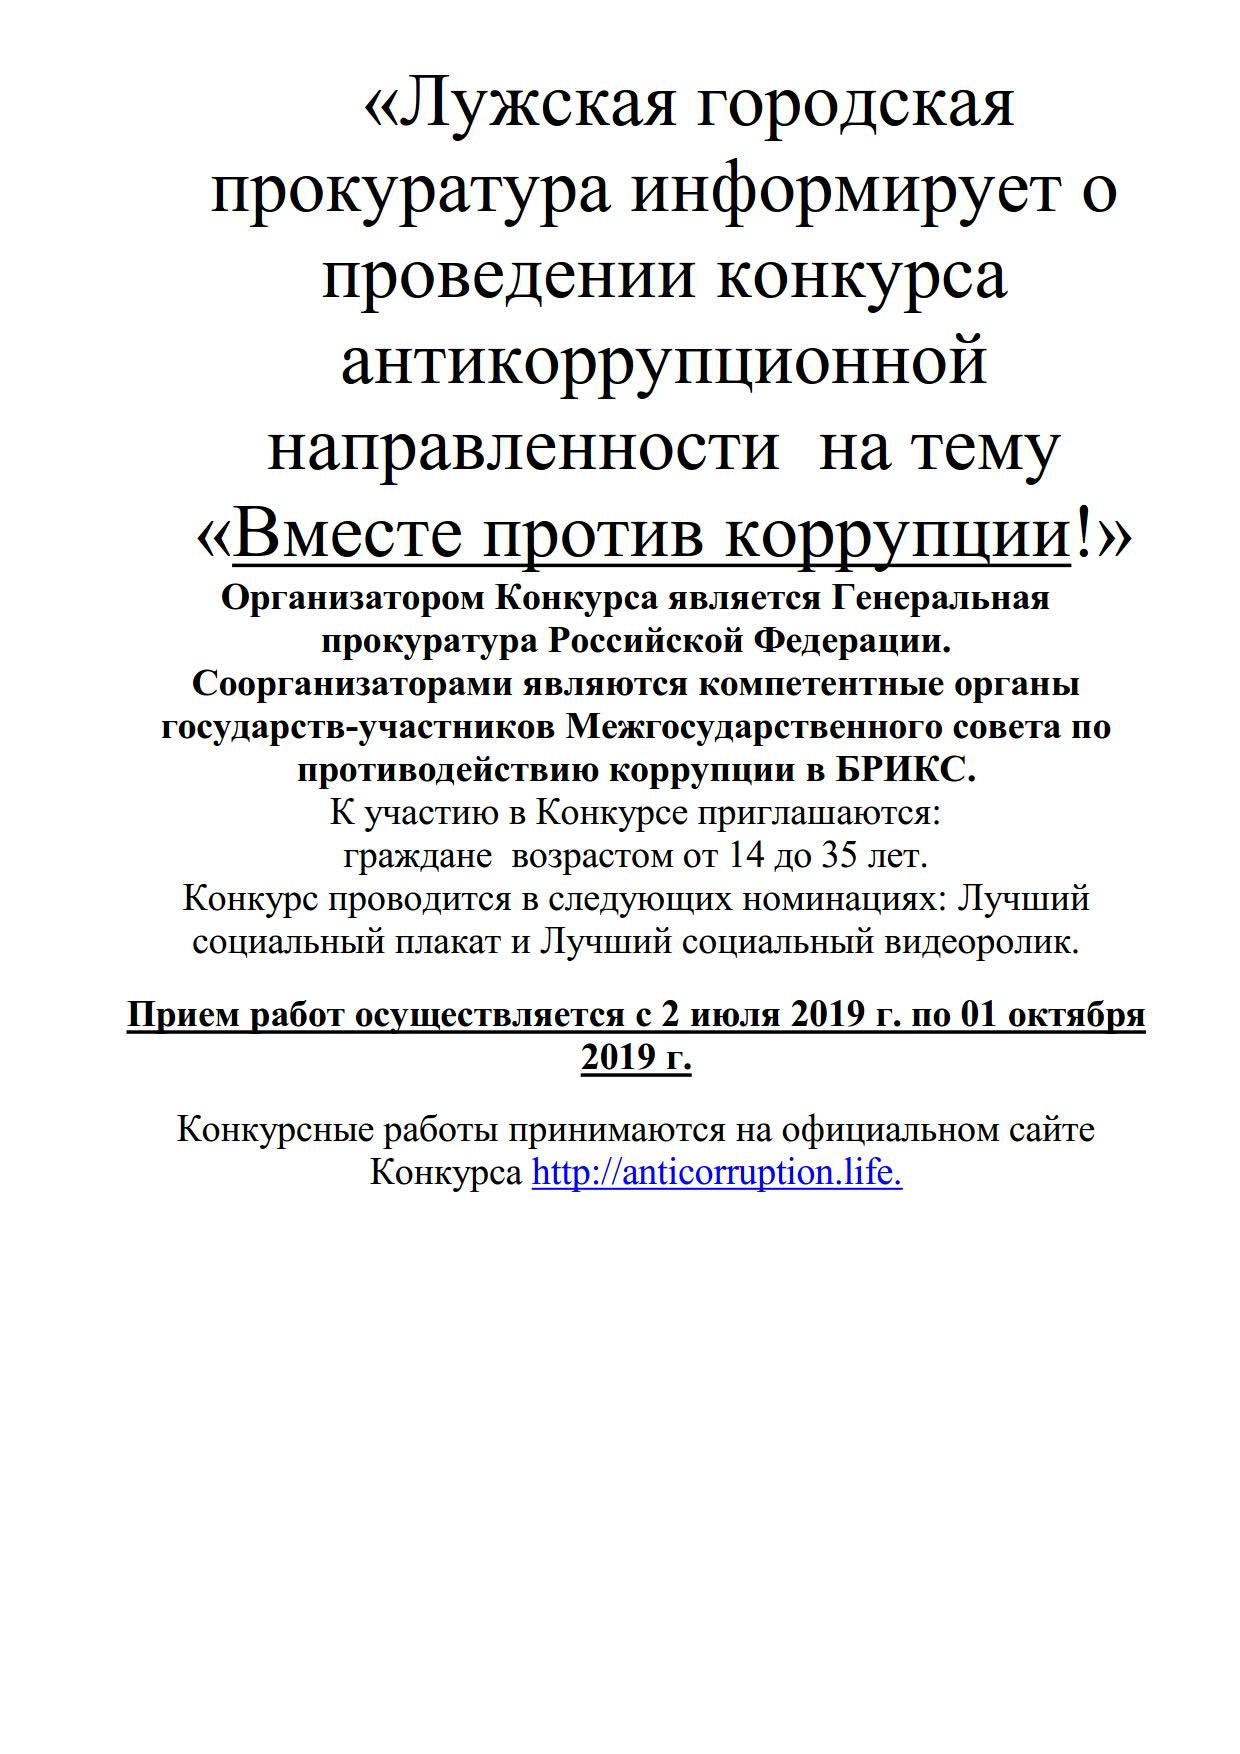 конкурс ВМЕСТЕ ПРОТИВ КОРРУПЦИИ_1